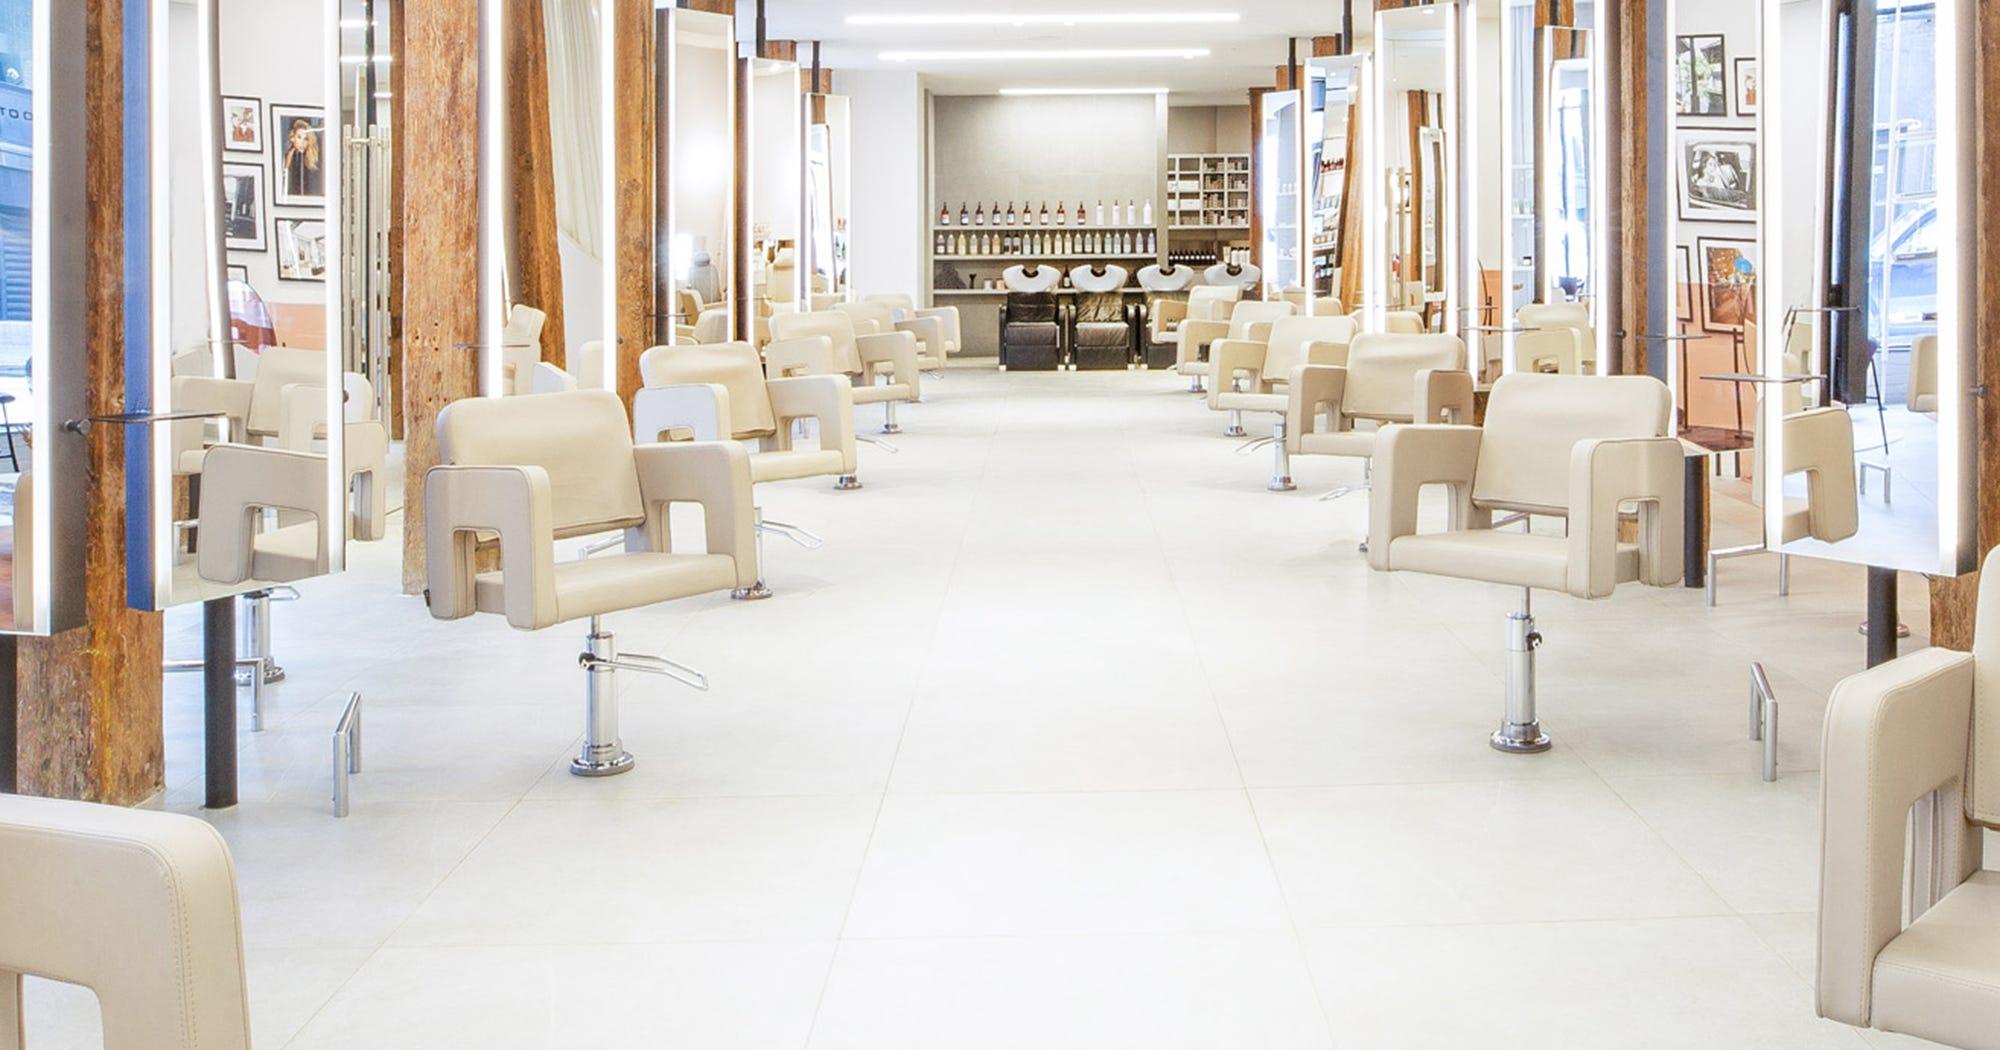 hairdressing salon design ideas interior decoration in interior stylists new york Refinery29